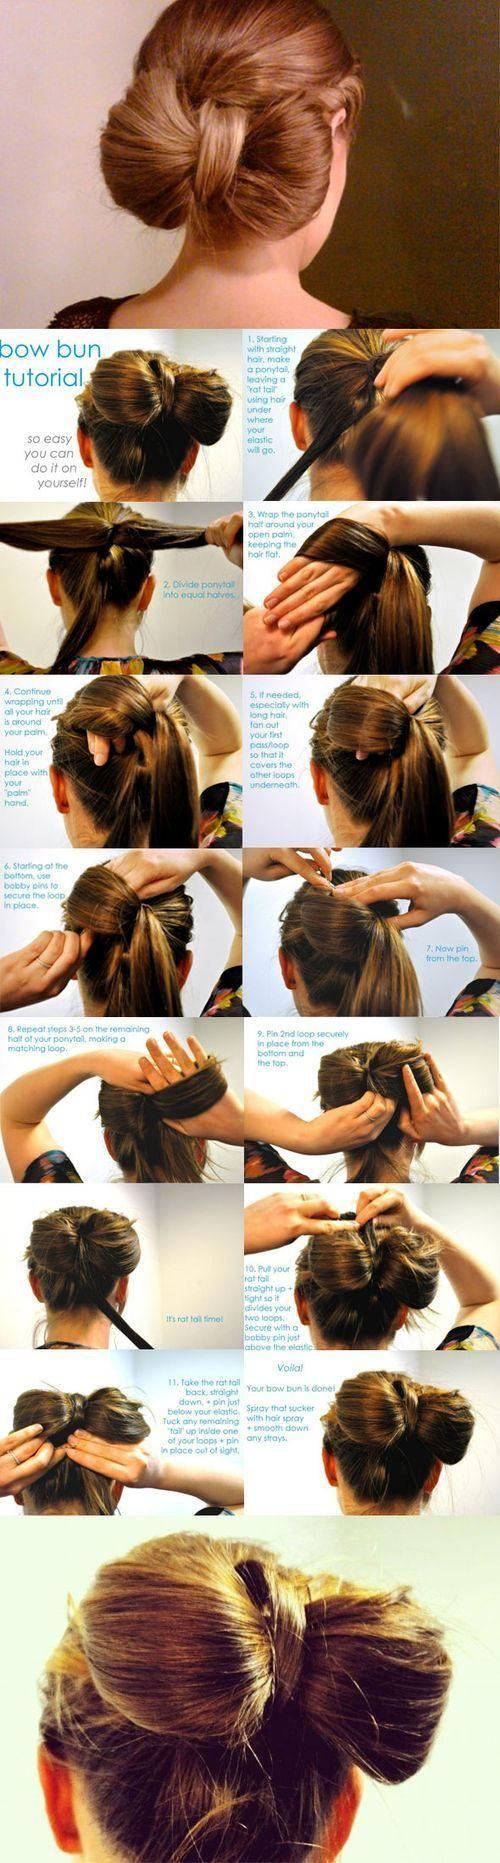 Diy hair - Bow bun tutorial